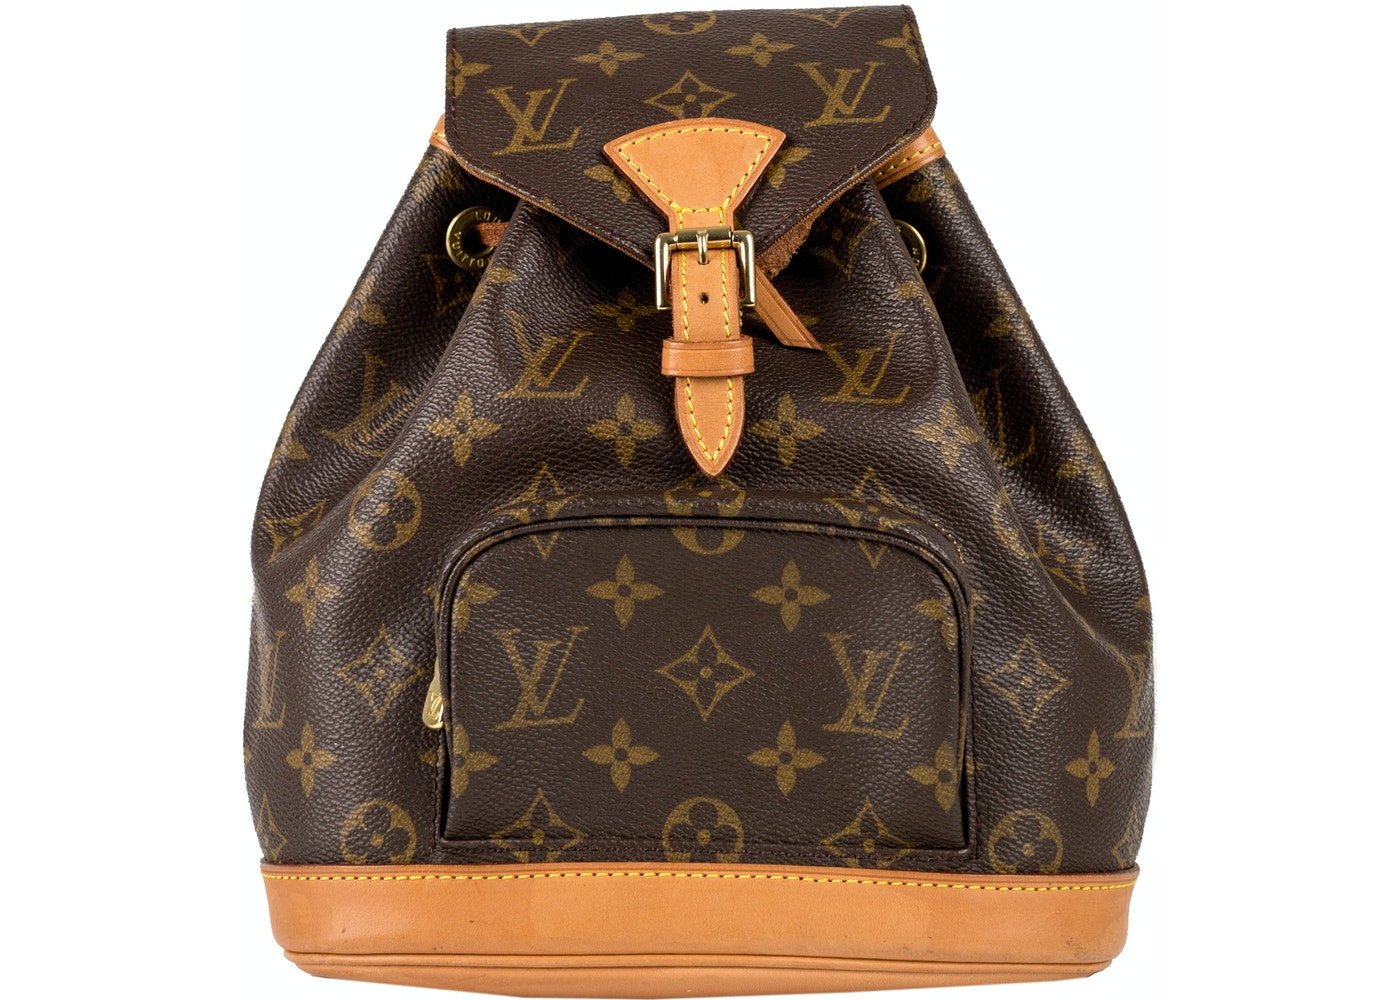 645c2b730df6 Louis Vuitton Montsouris Monogram MM Brown. Monogram MM Brown